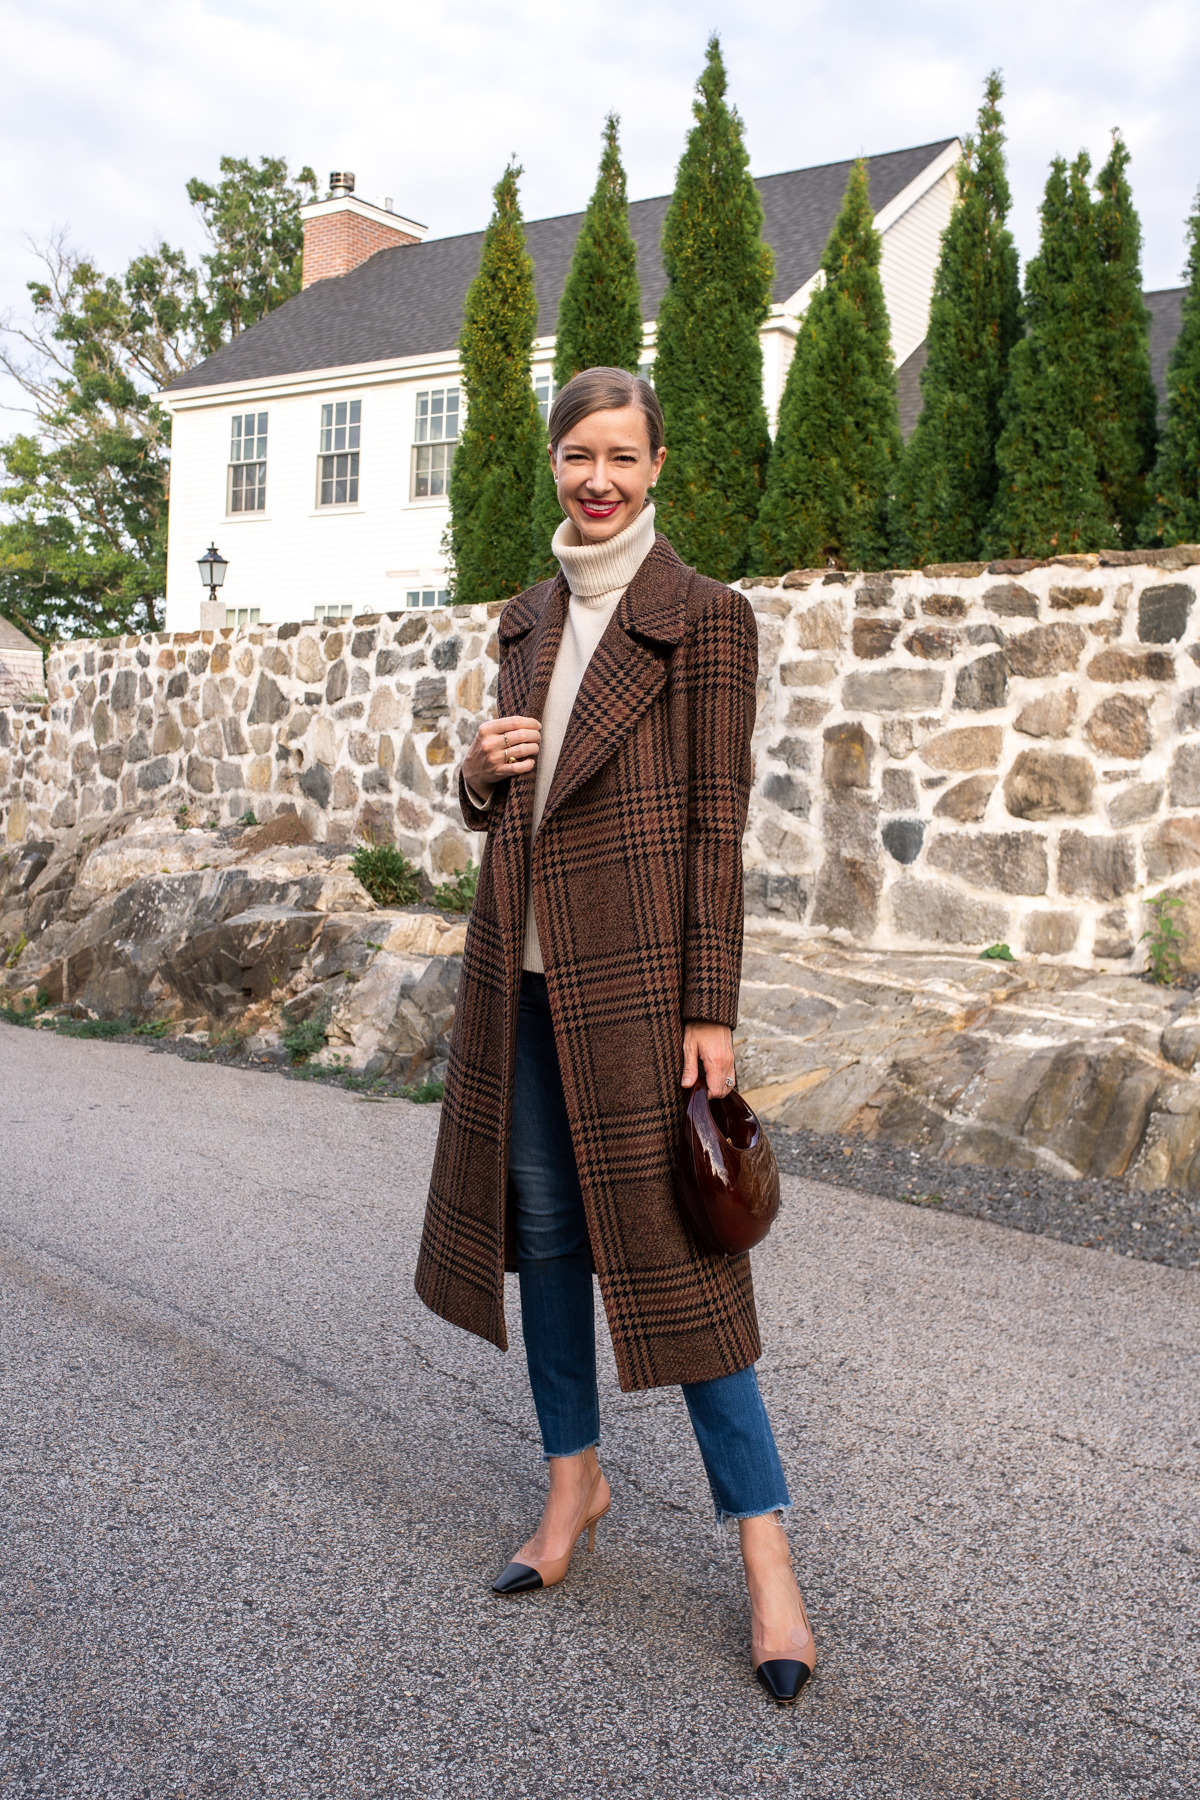 Stacie Flinner x Farfetch Plaid Wrap Coat-1.jpg